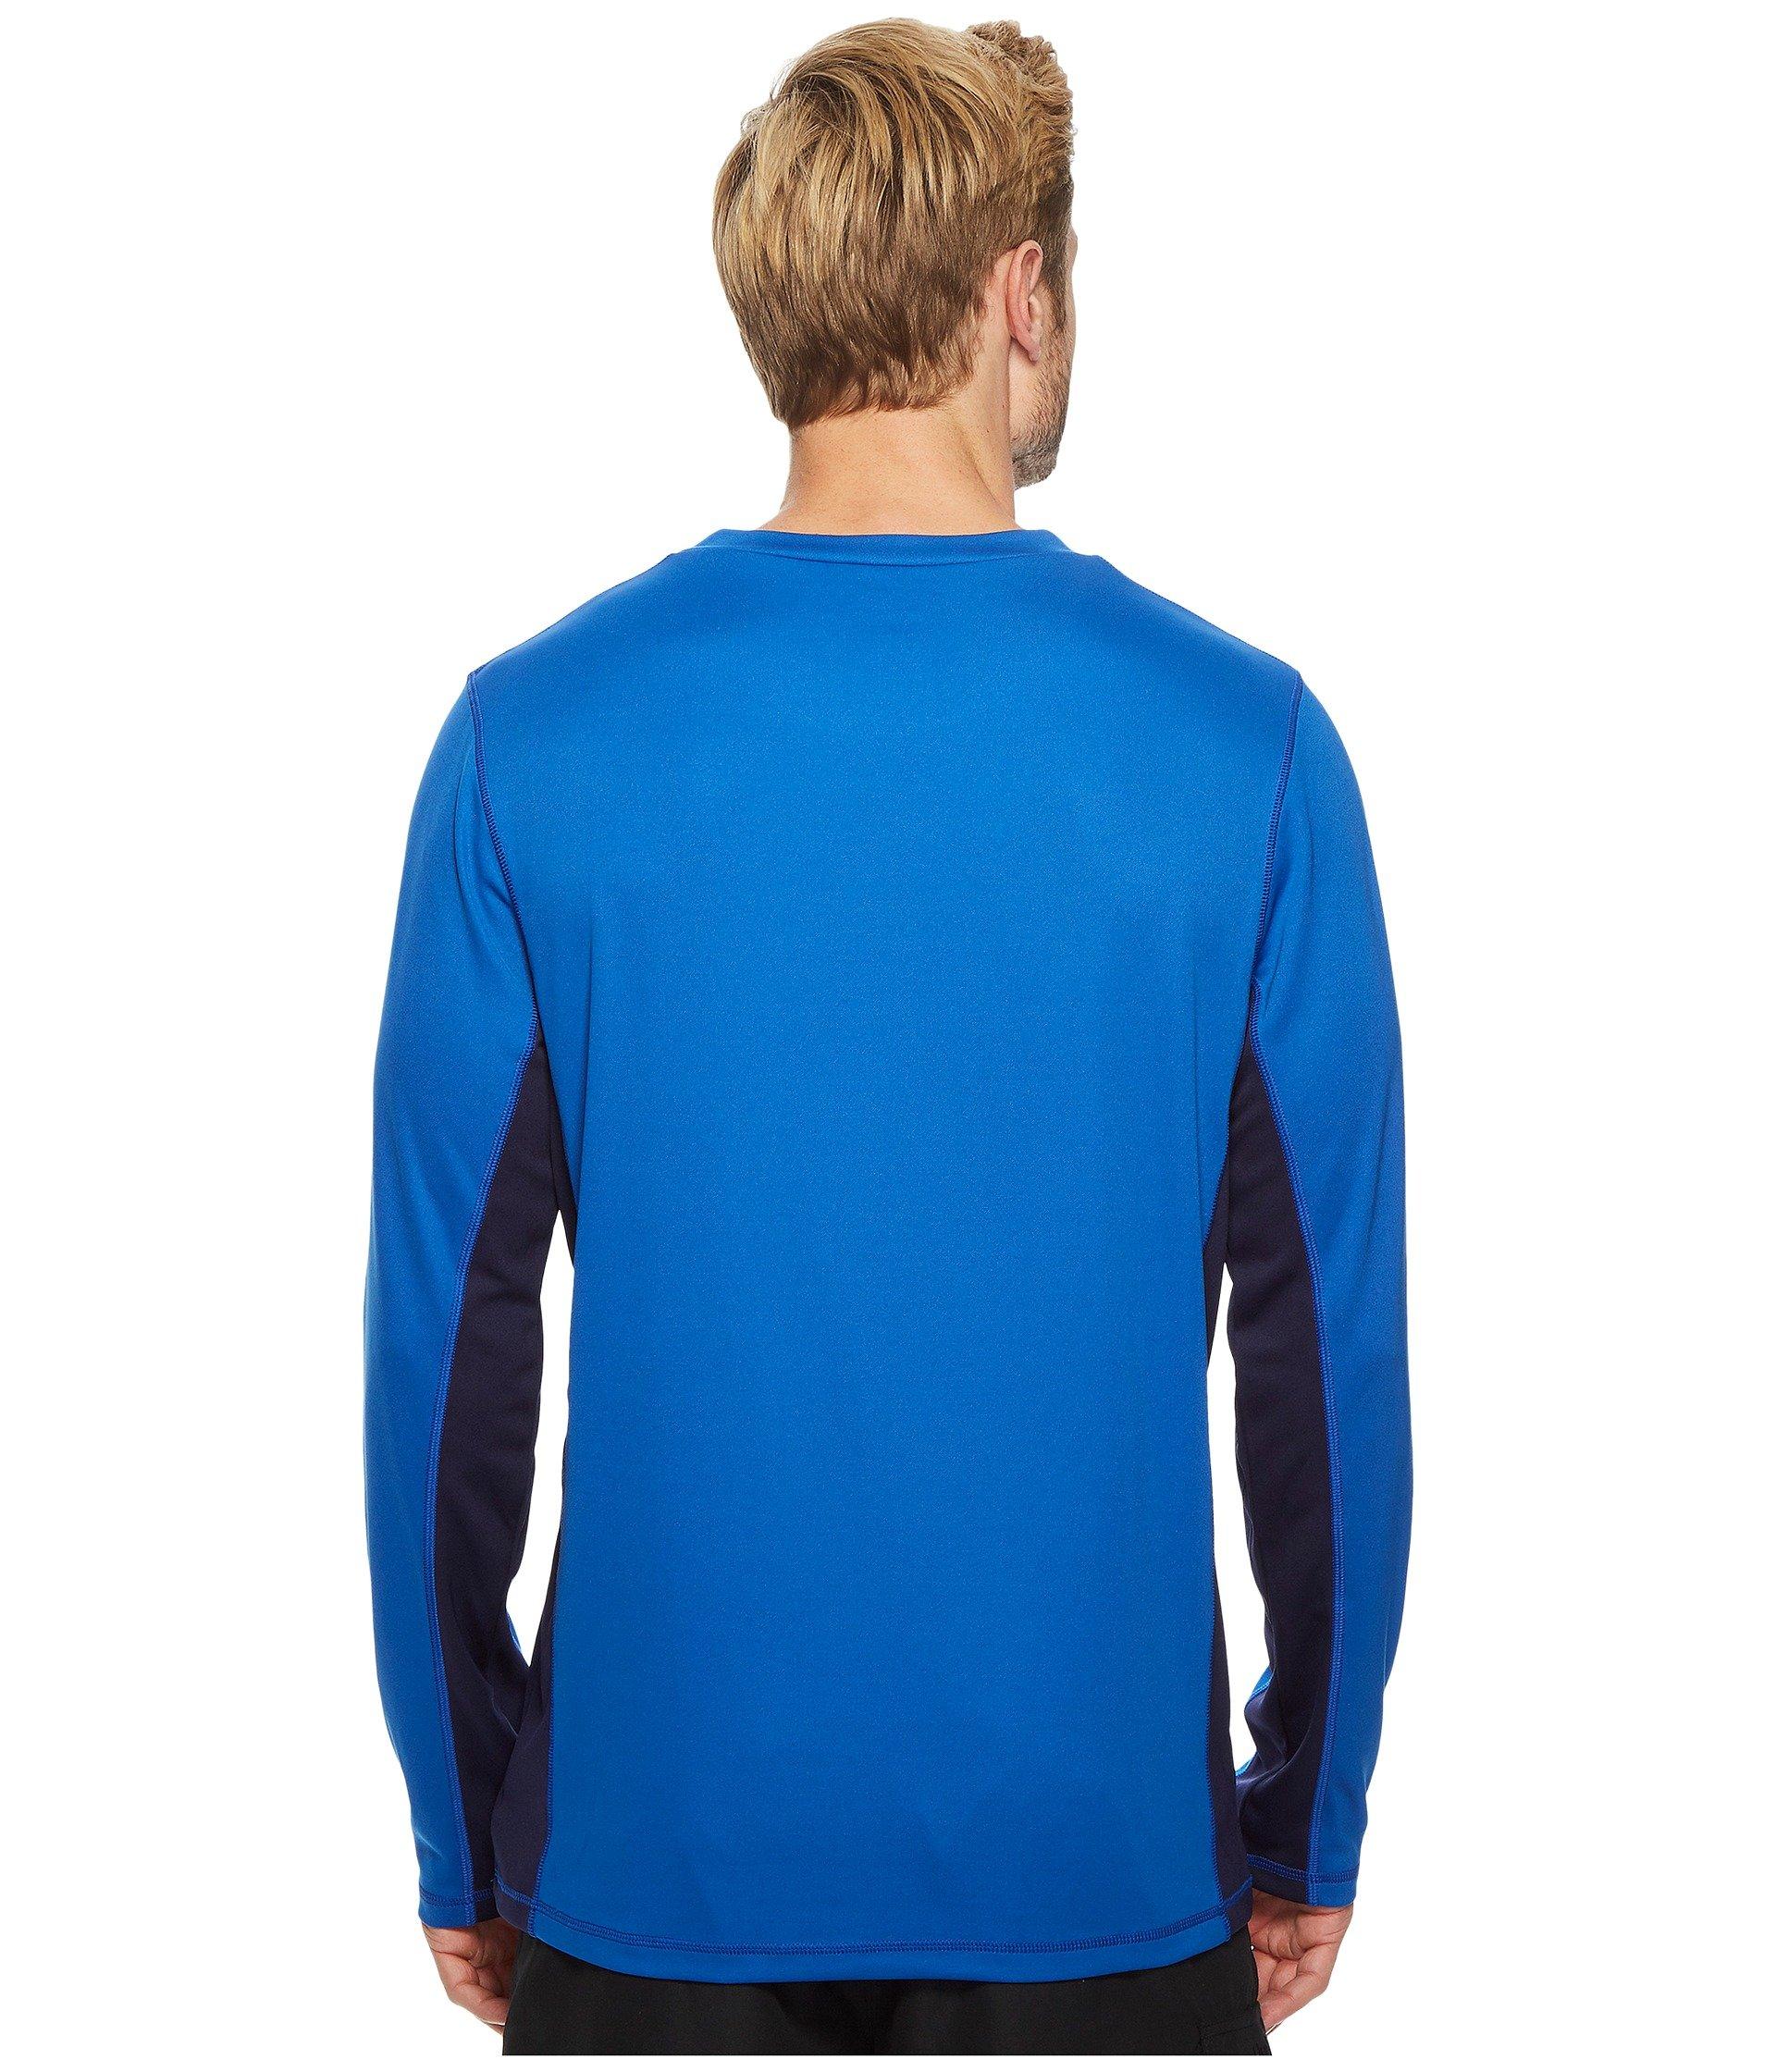 Swim Blue Speedo Sleeve Longview Tee Long Classic TrYYxn